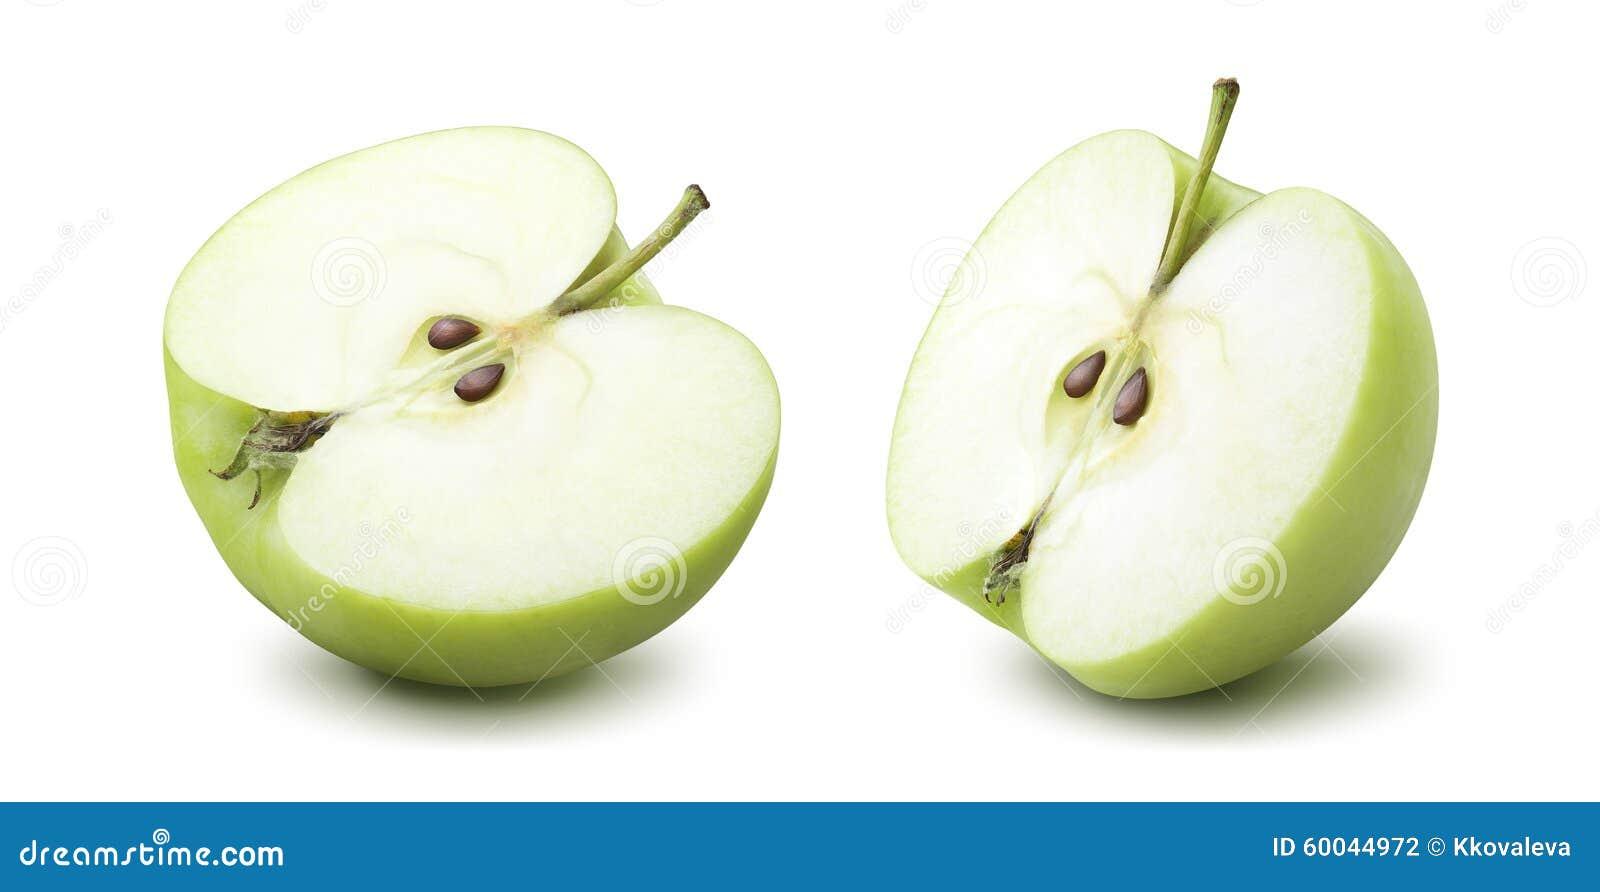 Call options on apple stock